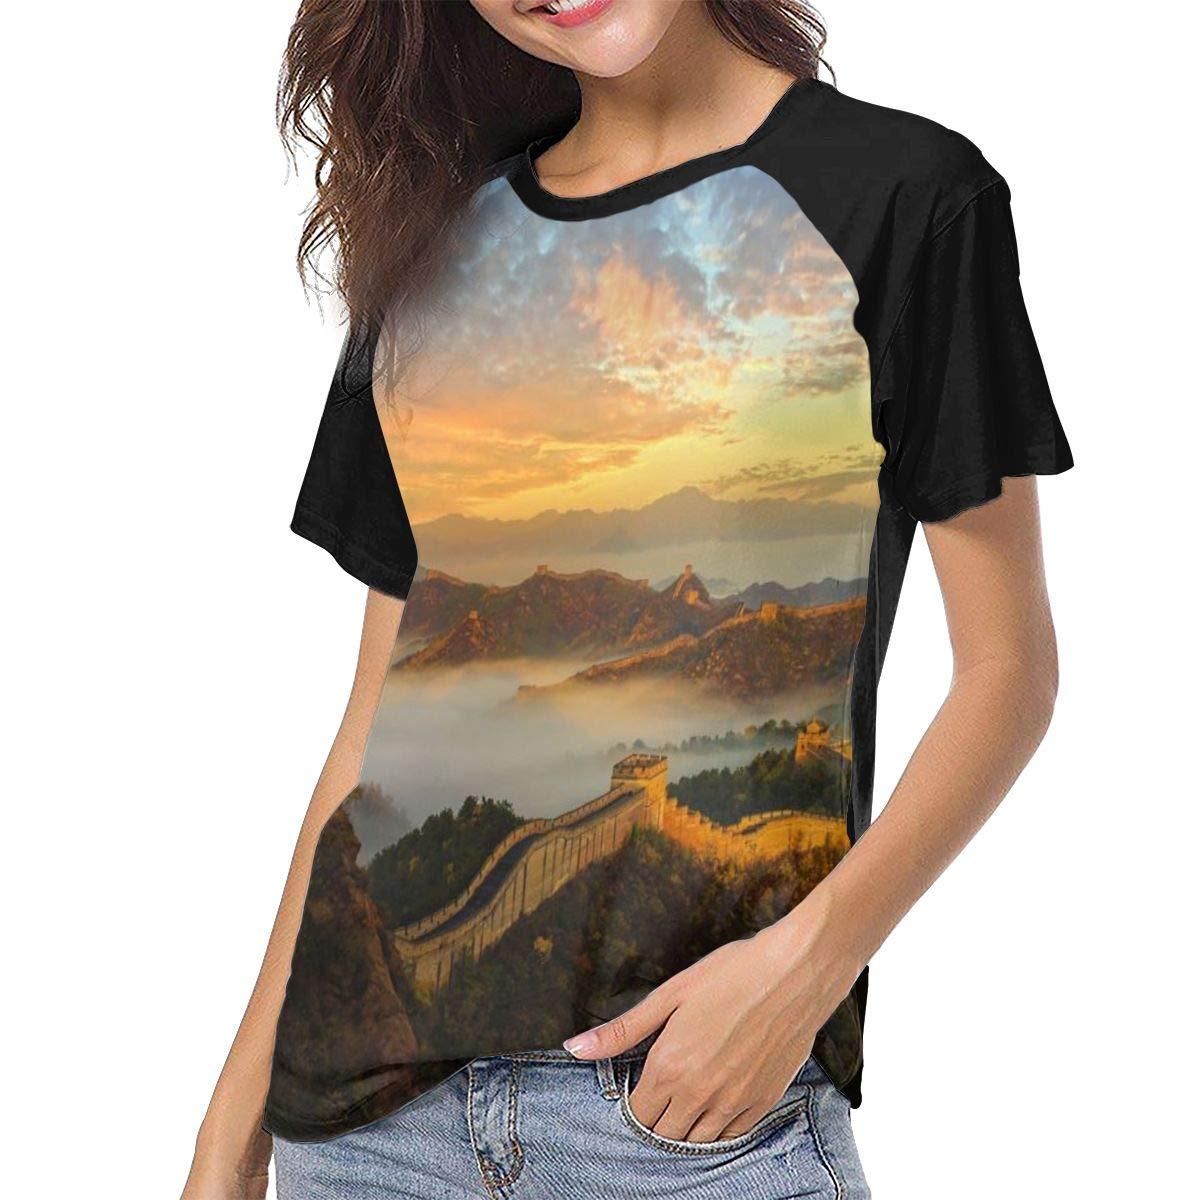 Great Wall of China Landscape Casual Raglan Tee Baseball Tshirts Tops Blouse Womens Summer Short Sleeve